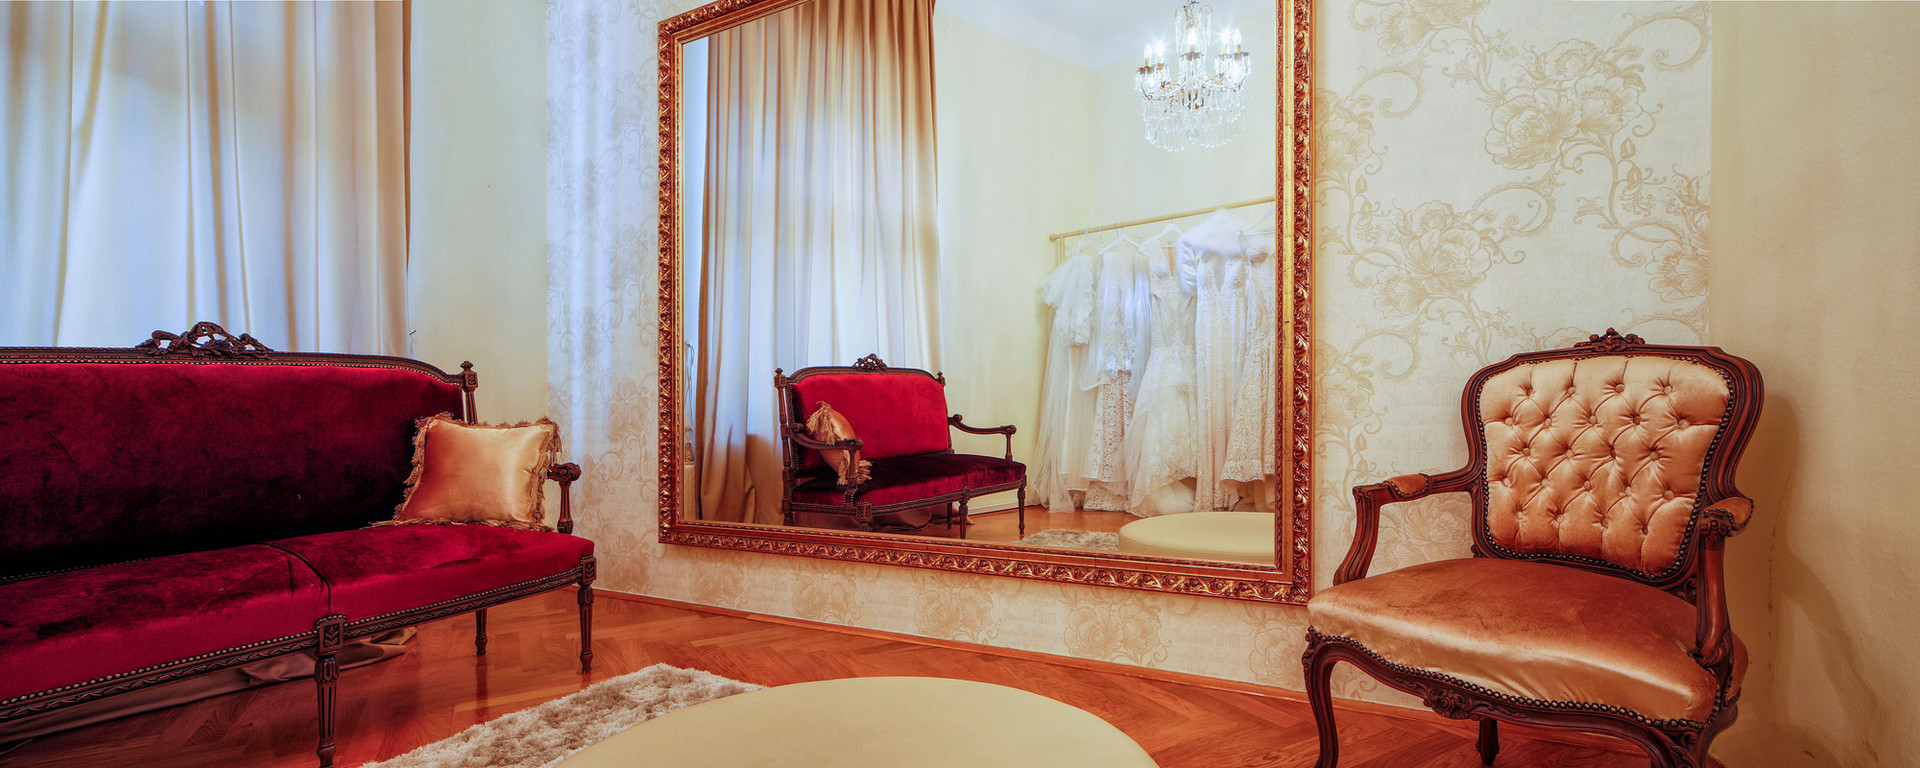 salon_foto11.jpg